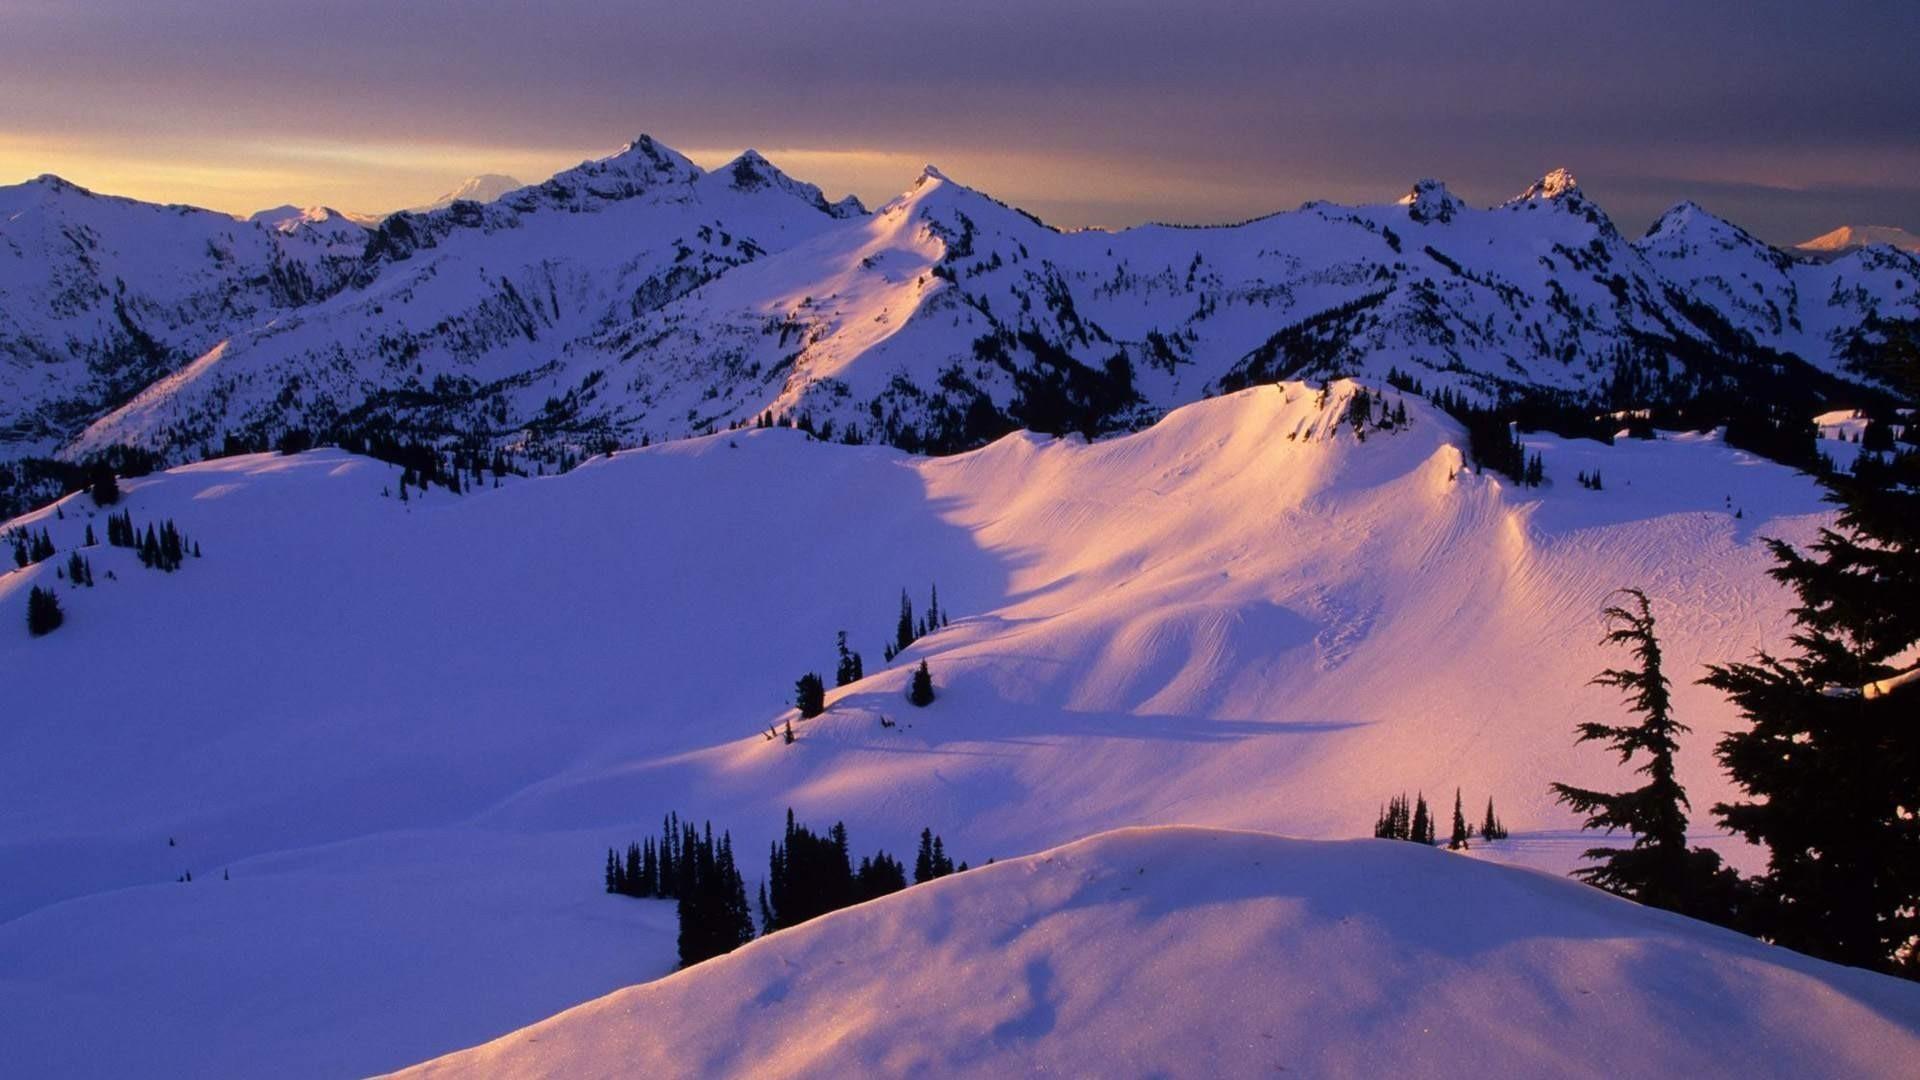 гора снег ели зима mountain snow ate winter скачать